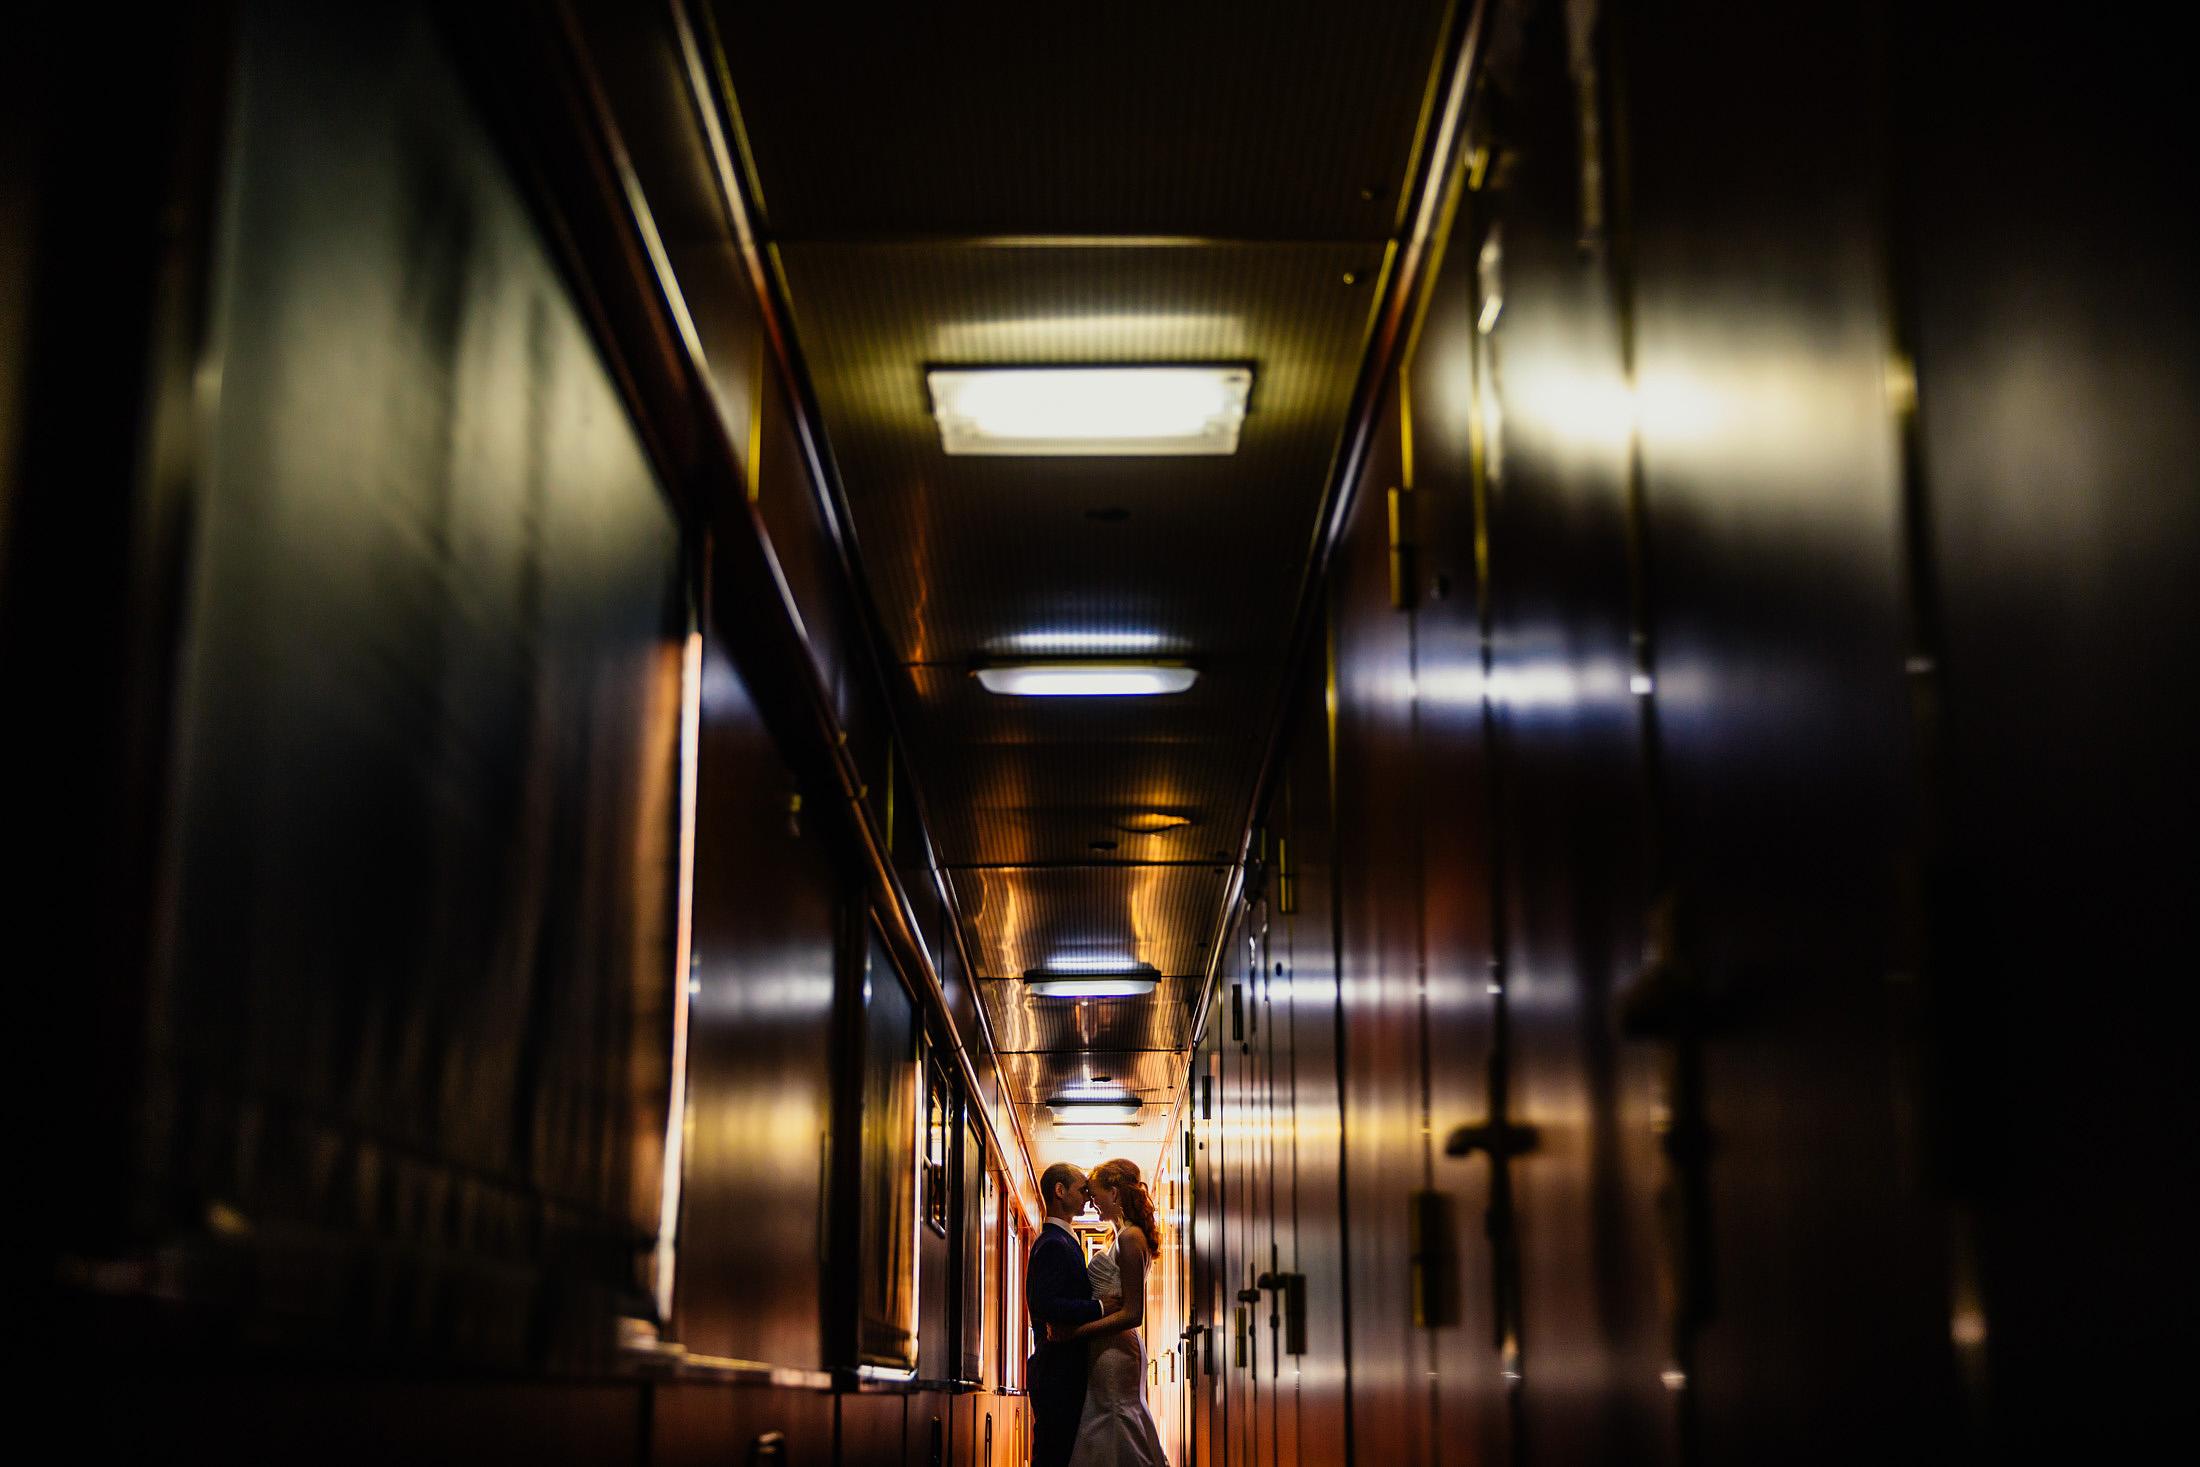 07-Bruiloft-Fotoshoot-Amsterdam